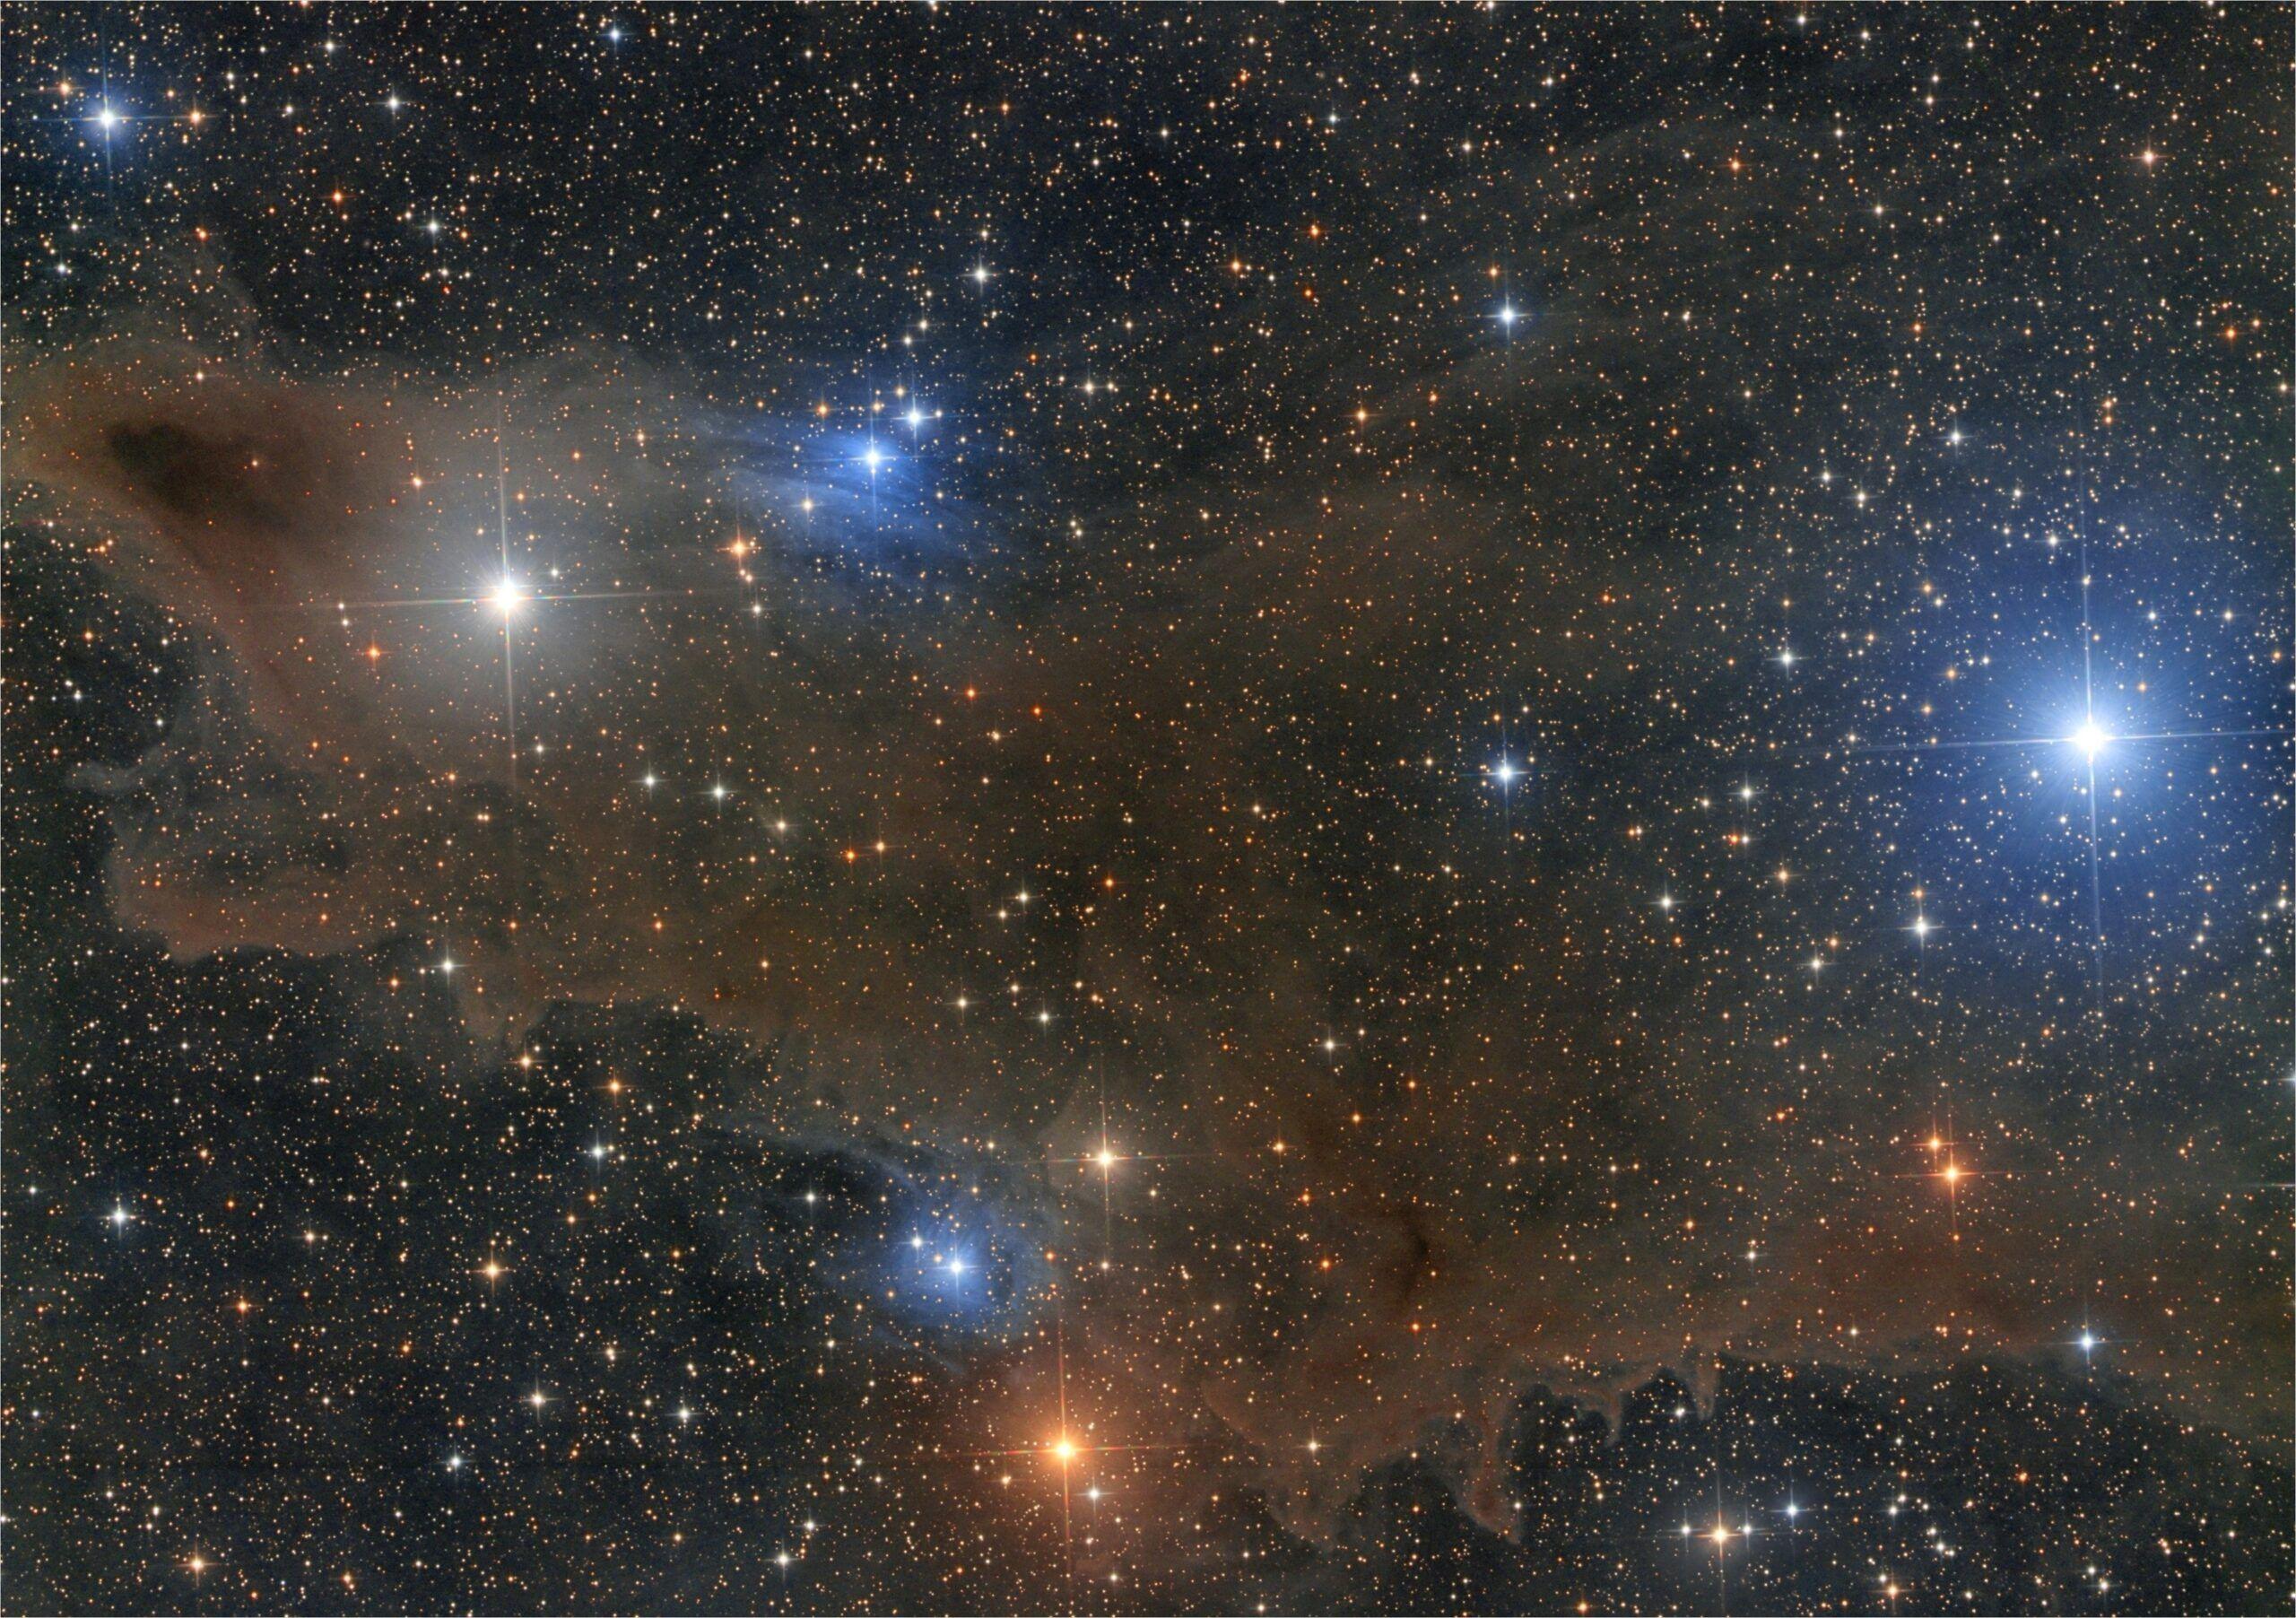 4k Pc Wallpaper Space In 2020 Nebula Wallpaper Space Orion Nebula